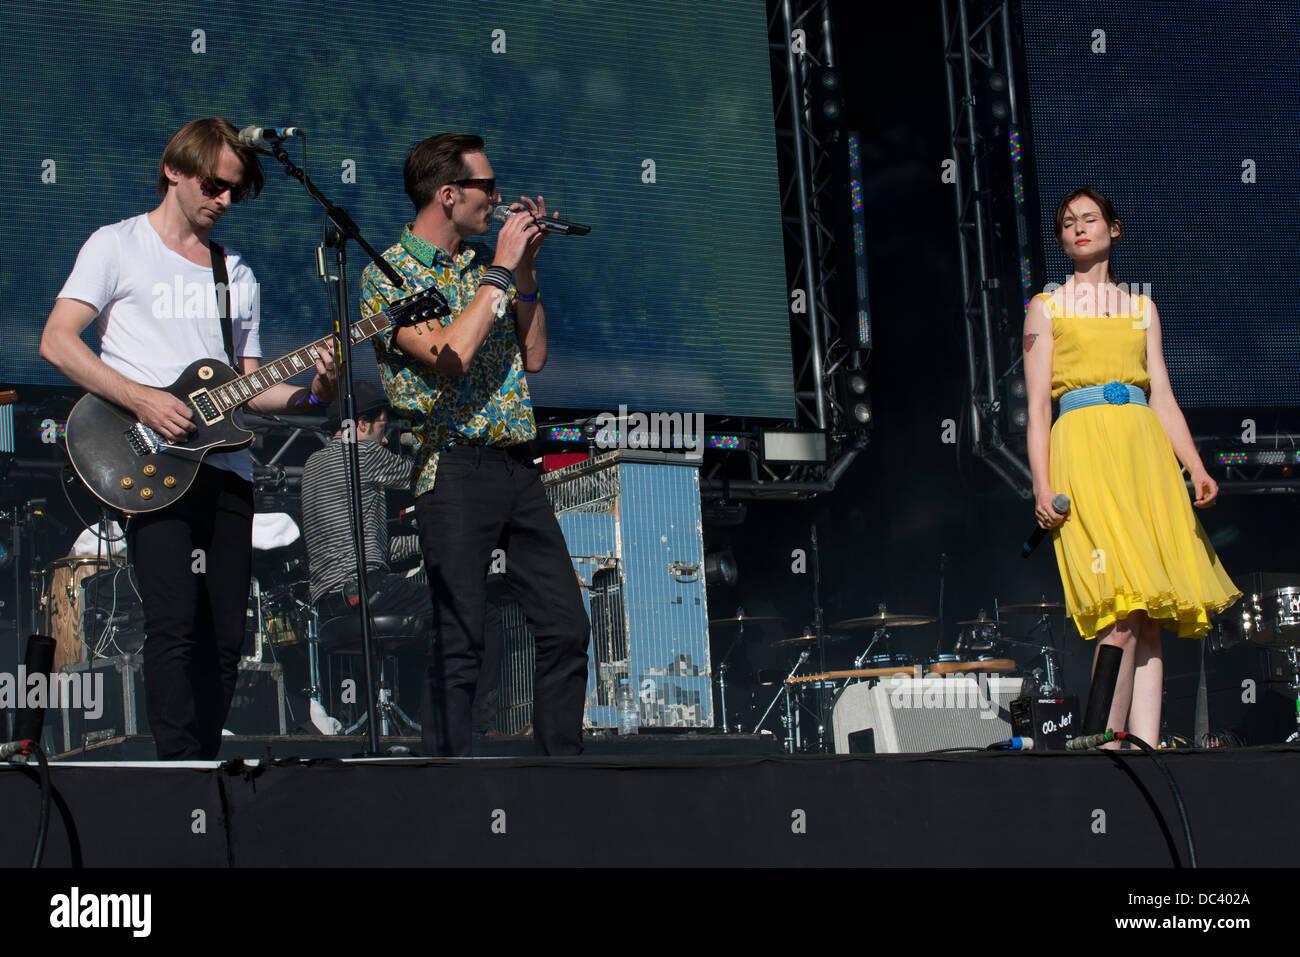 Dan Gillespie Sells The Feeling + Sophie Ellis-Bextor Performs at Go Local, Queen Elizabeth Olympic Park, London. - Stock Image